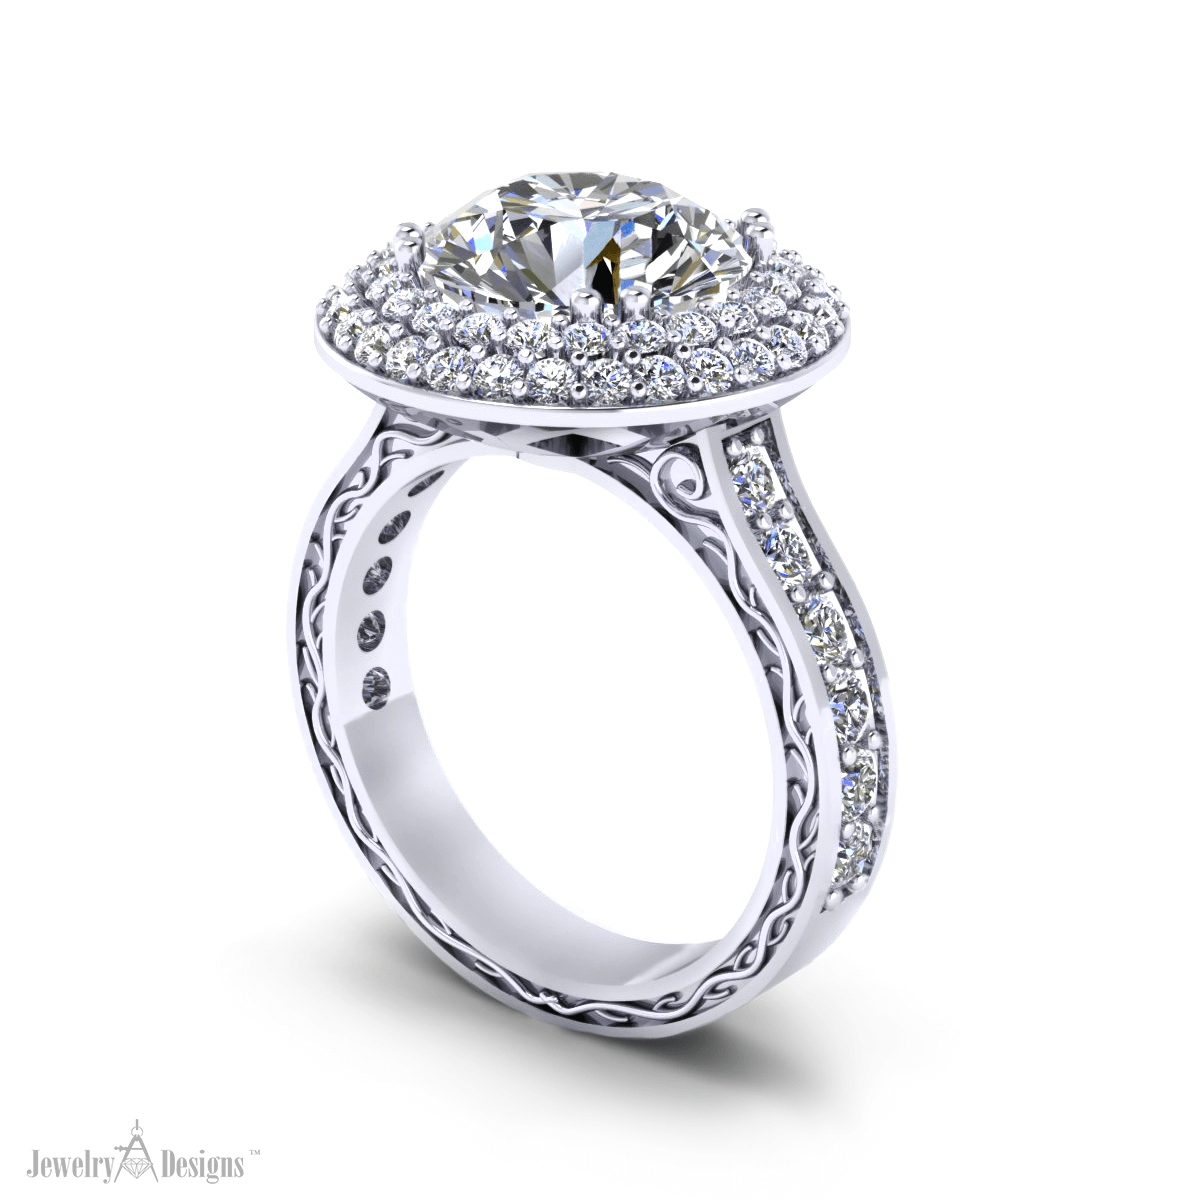 c150577 Ornate Diamond Ring